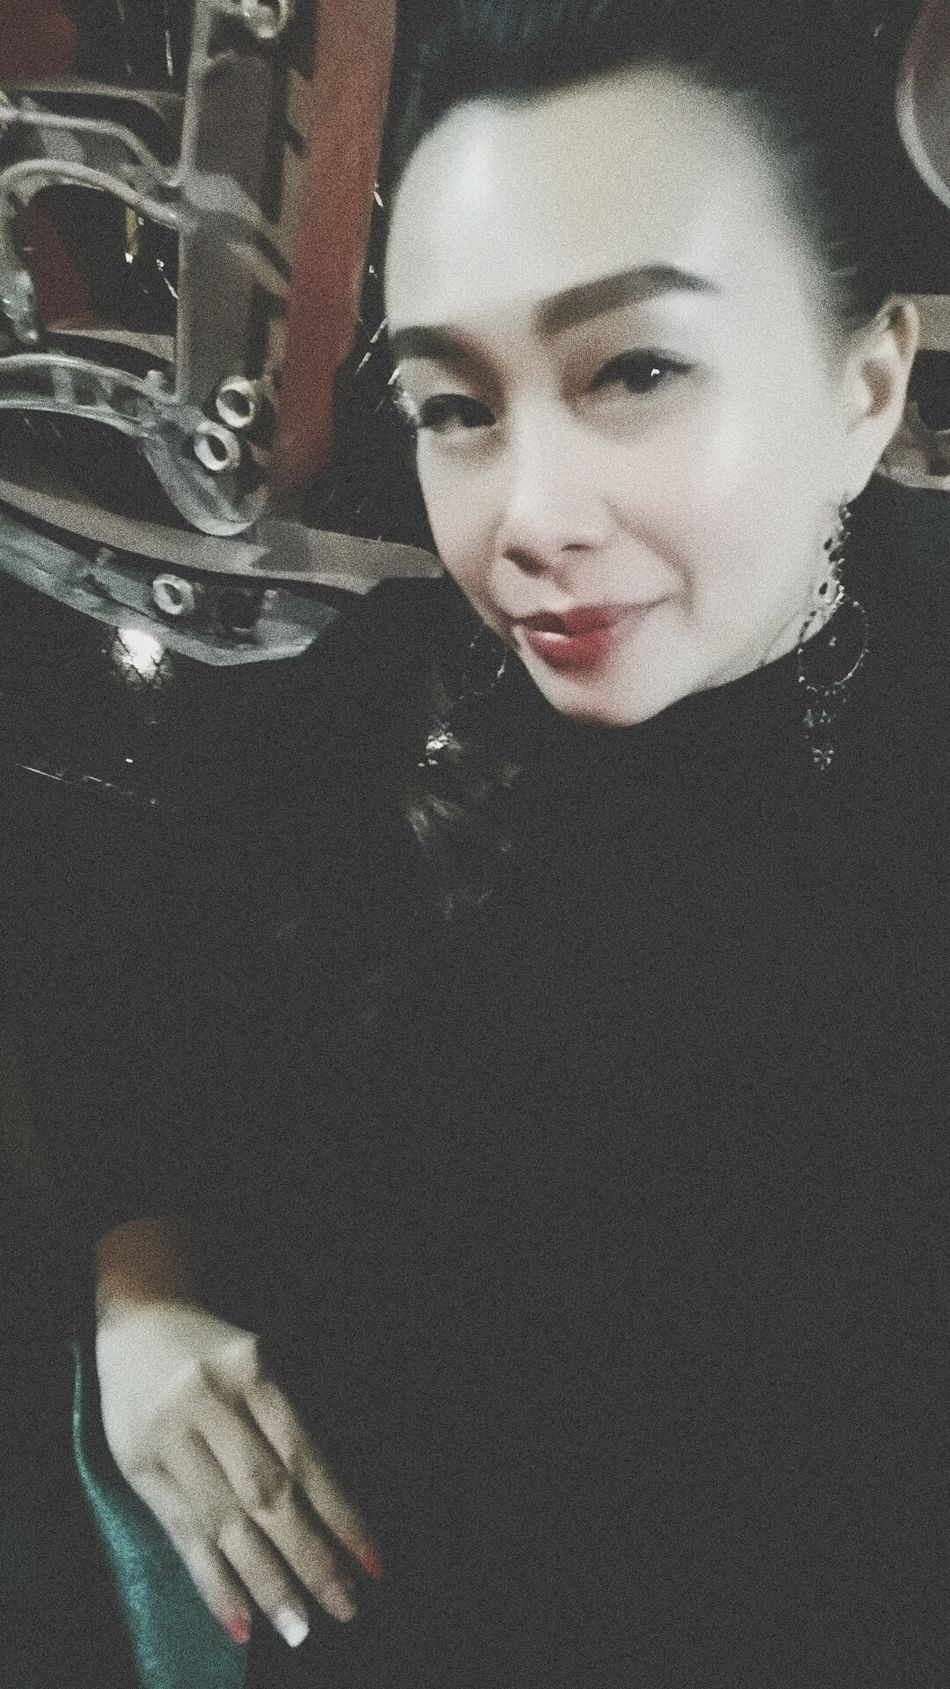 Looking At Camera Beautiful Woman Asian Beauty Faces Of EyeEm Friday ✌ Black My Fav Color